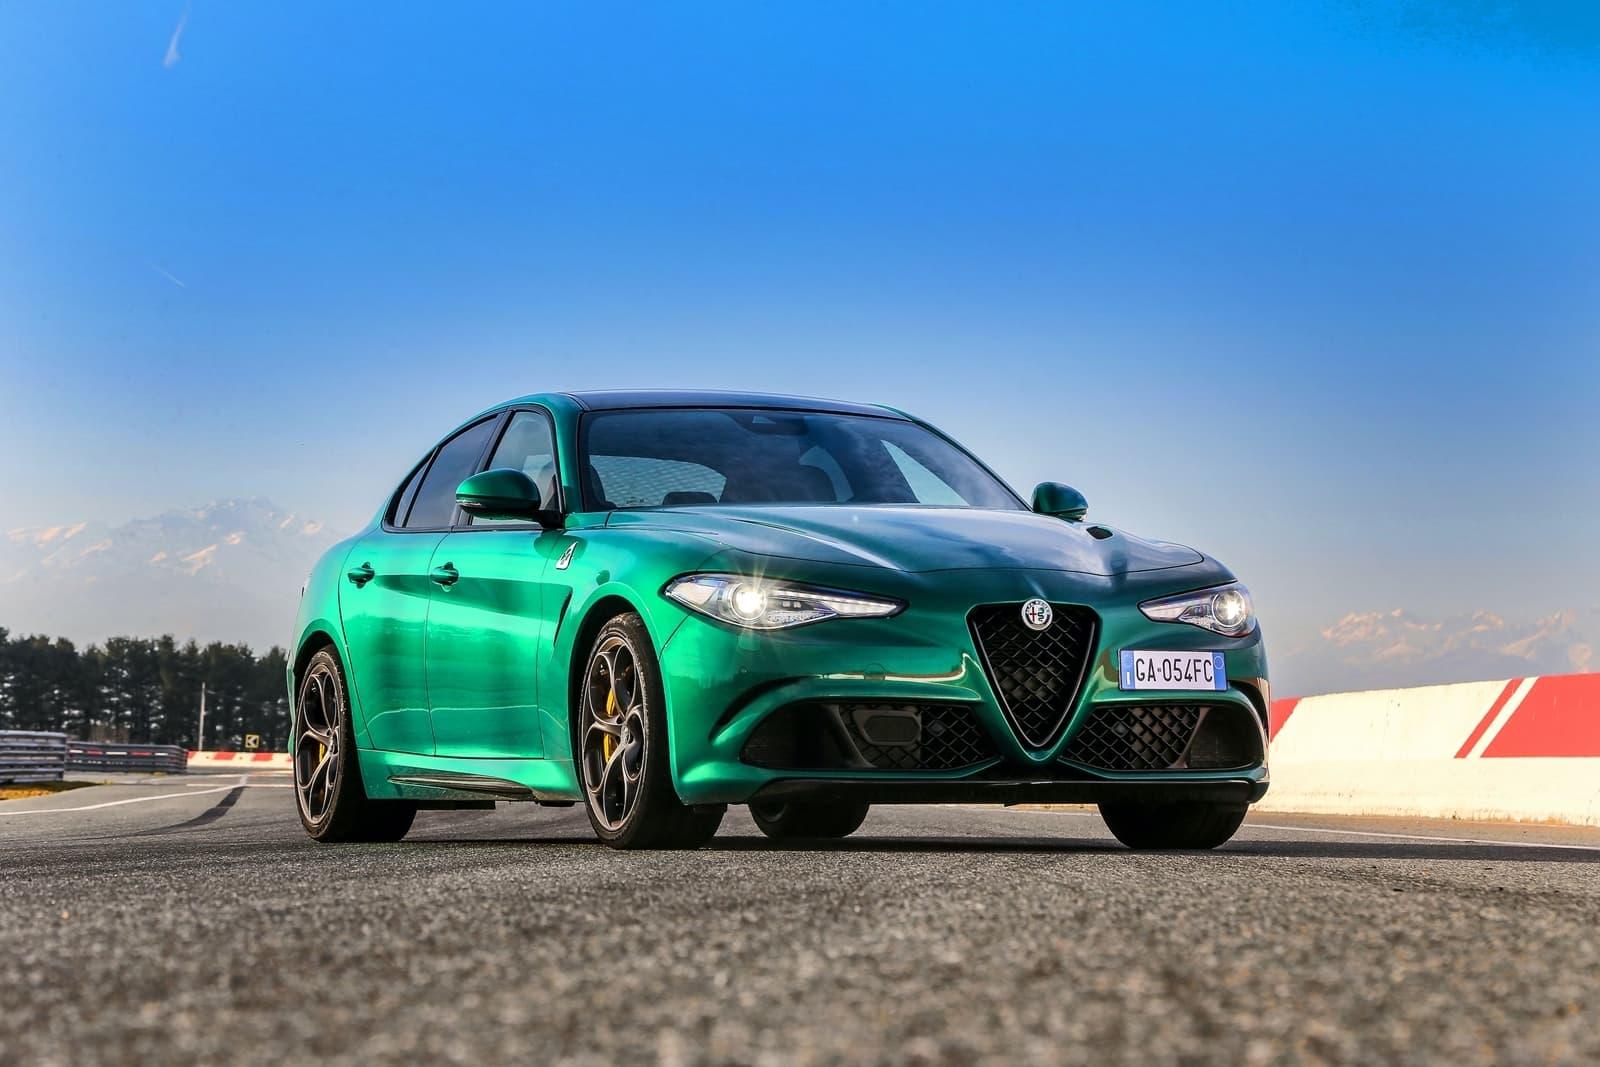 Alfa Romeo Giulia Stelvio Quadrifoglio 2020 0520 031